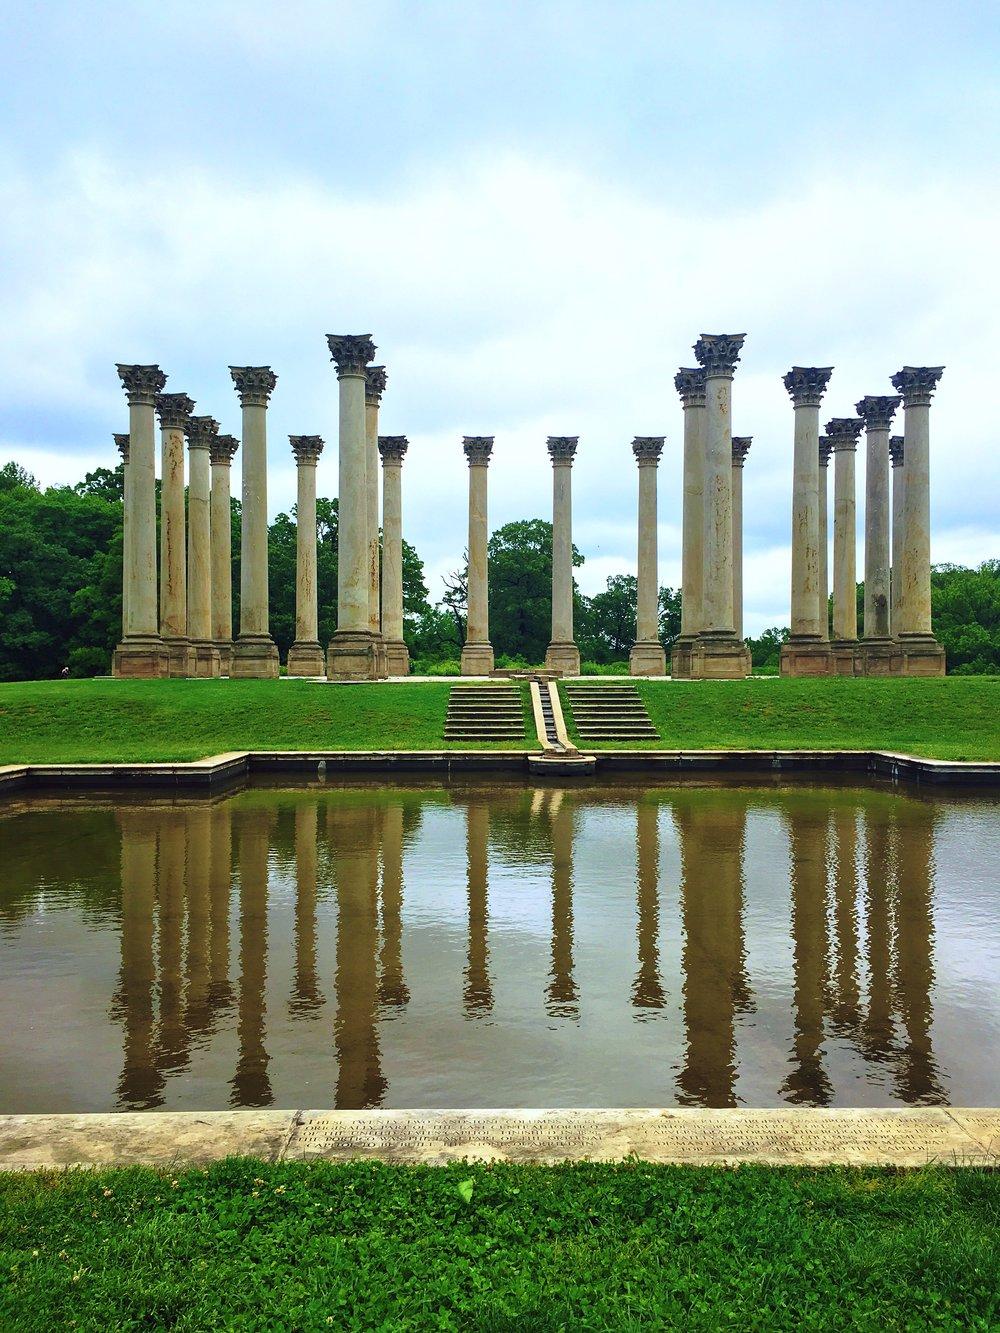 The National Arboretum in Washington DC